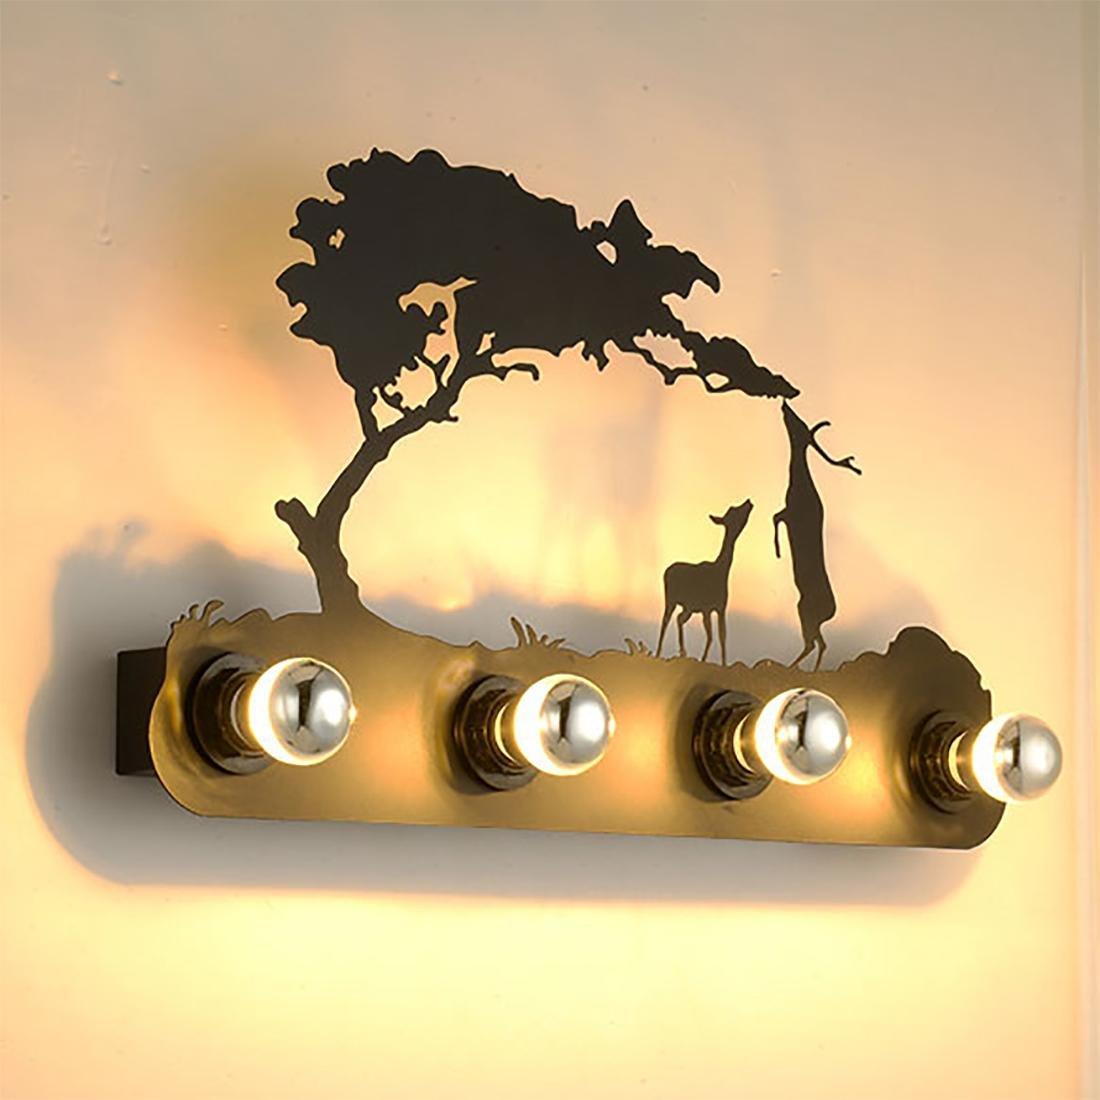 BENJUNLampada da parete europea Stile nordico Semplicità moderna Europa creativa Lampada da parete del salone Camera da letto lampada da parete Lampada da comodino LED cervo luce